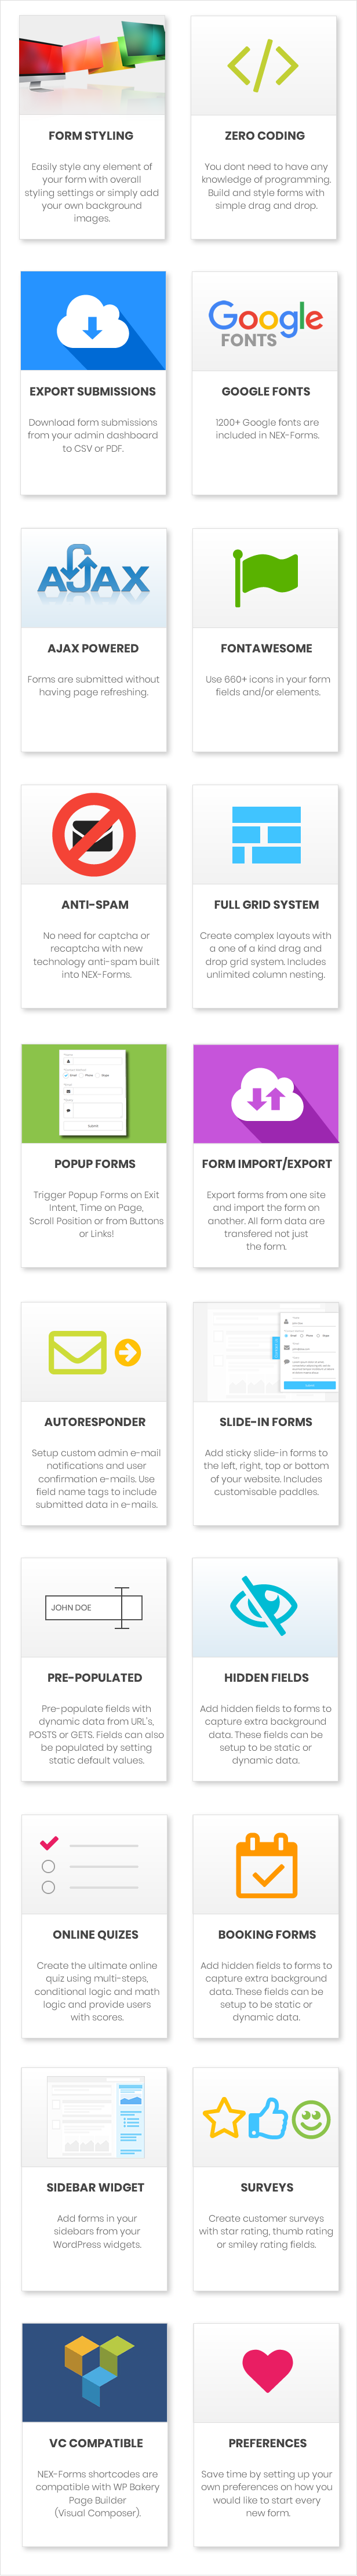 Best WordPress Form Builder Plugin - Overall Features